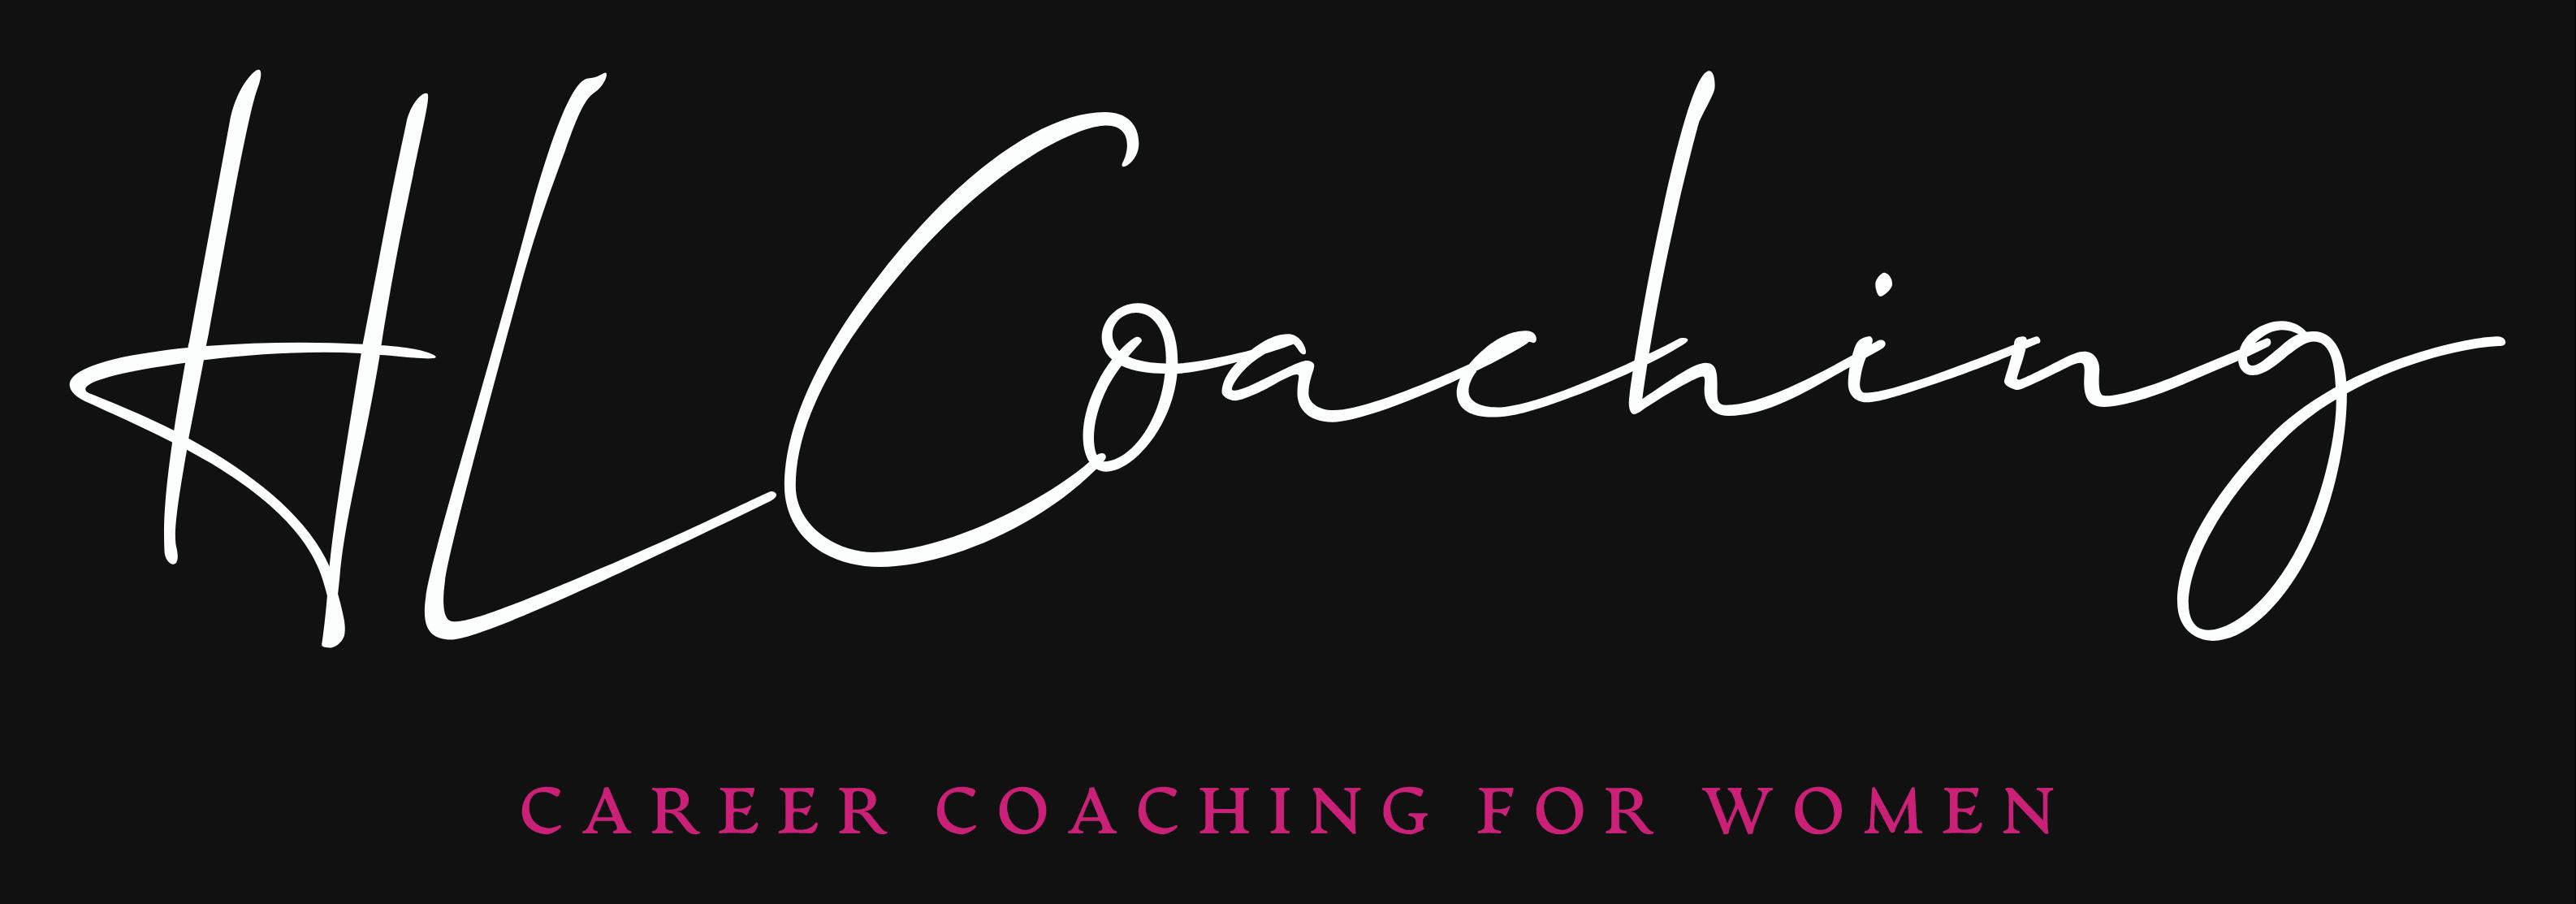 HL Coaching